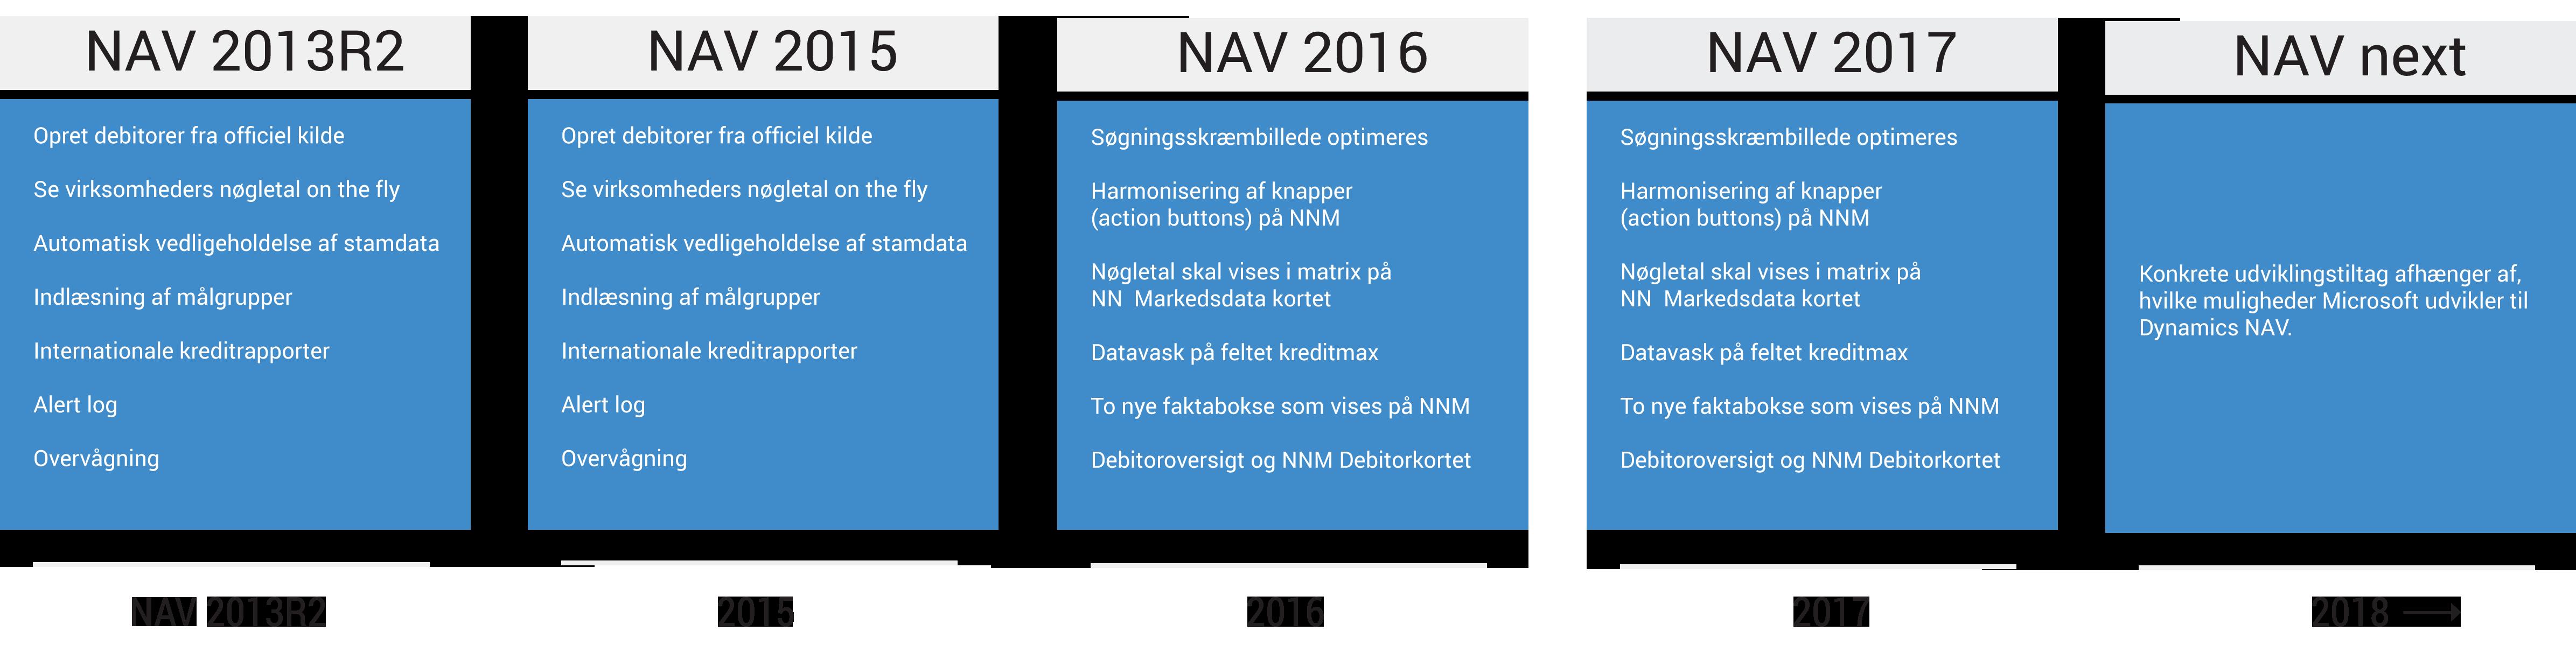 NAV roadmap.png